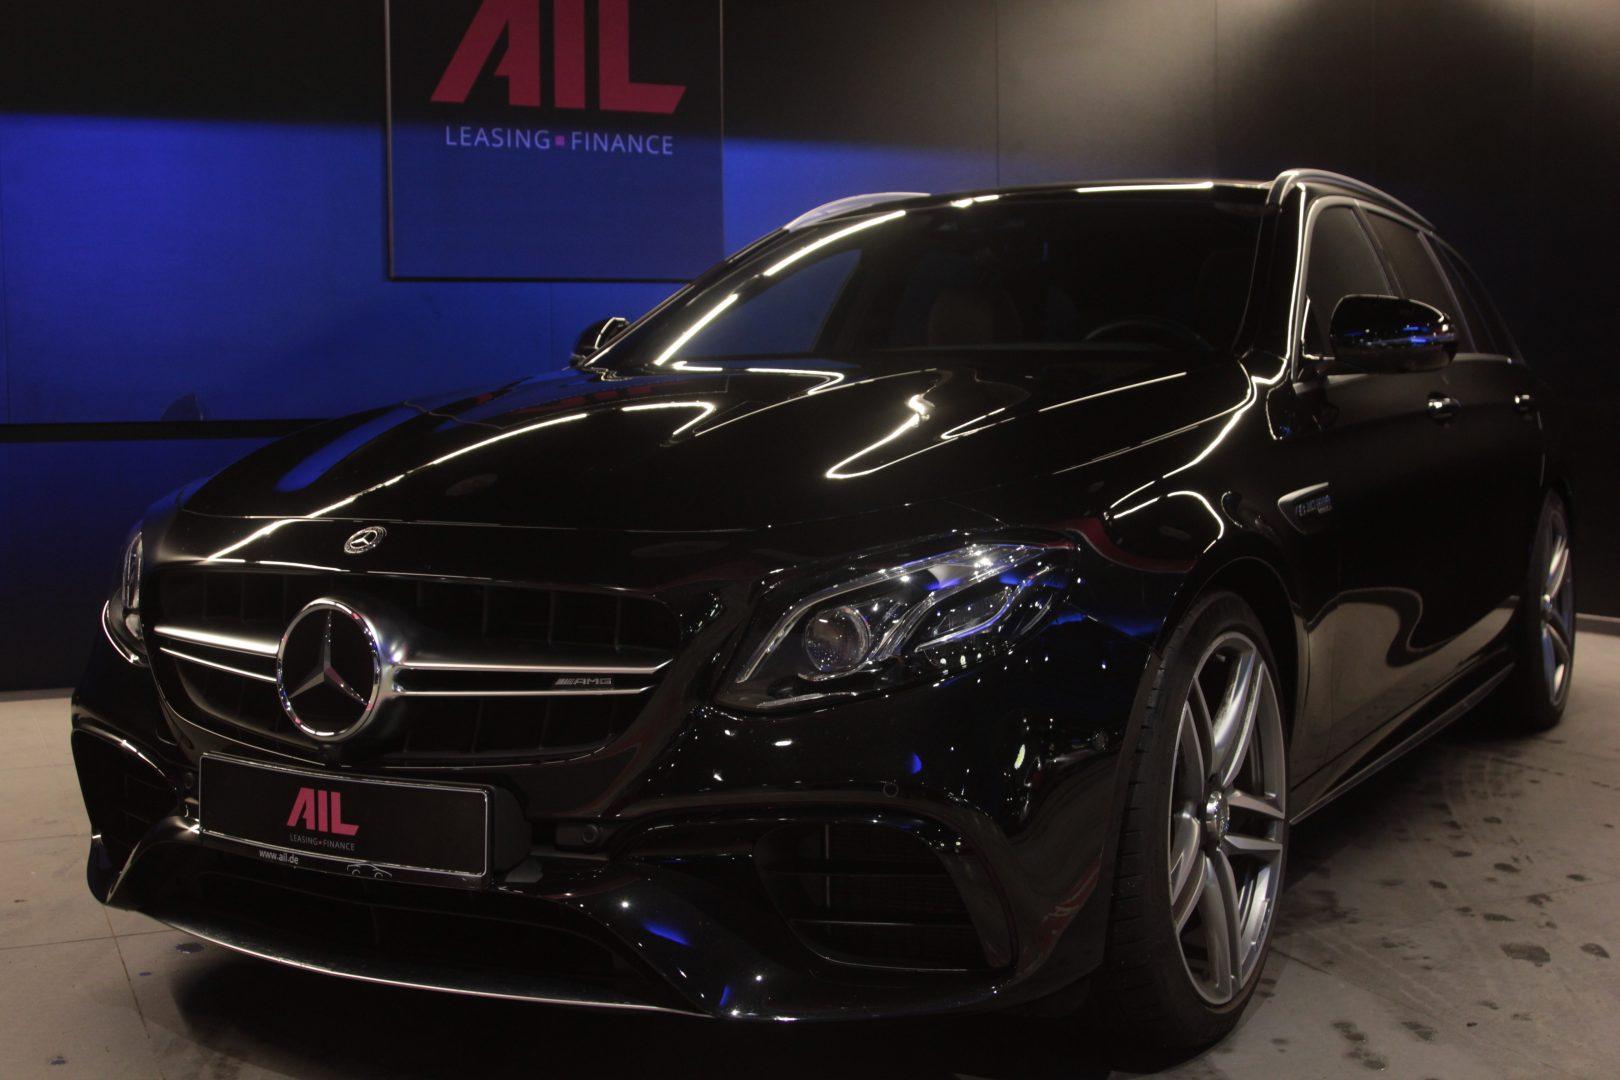 AIL Mercedes-Benz  E 63 AMG S 4Matic 14